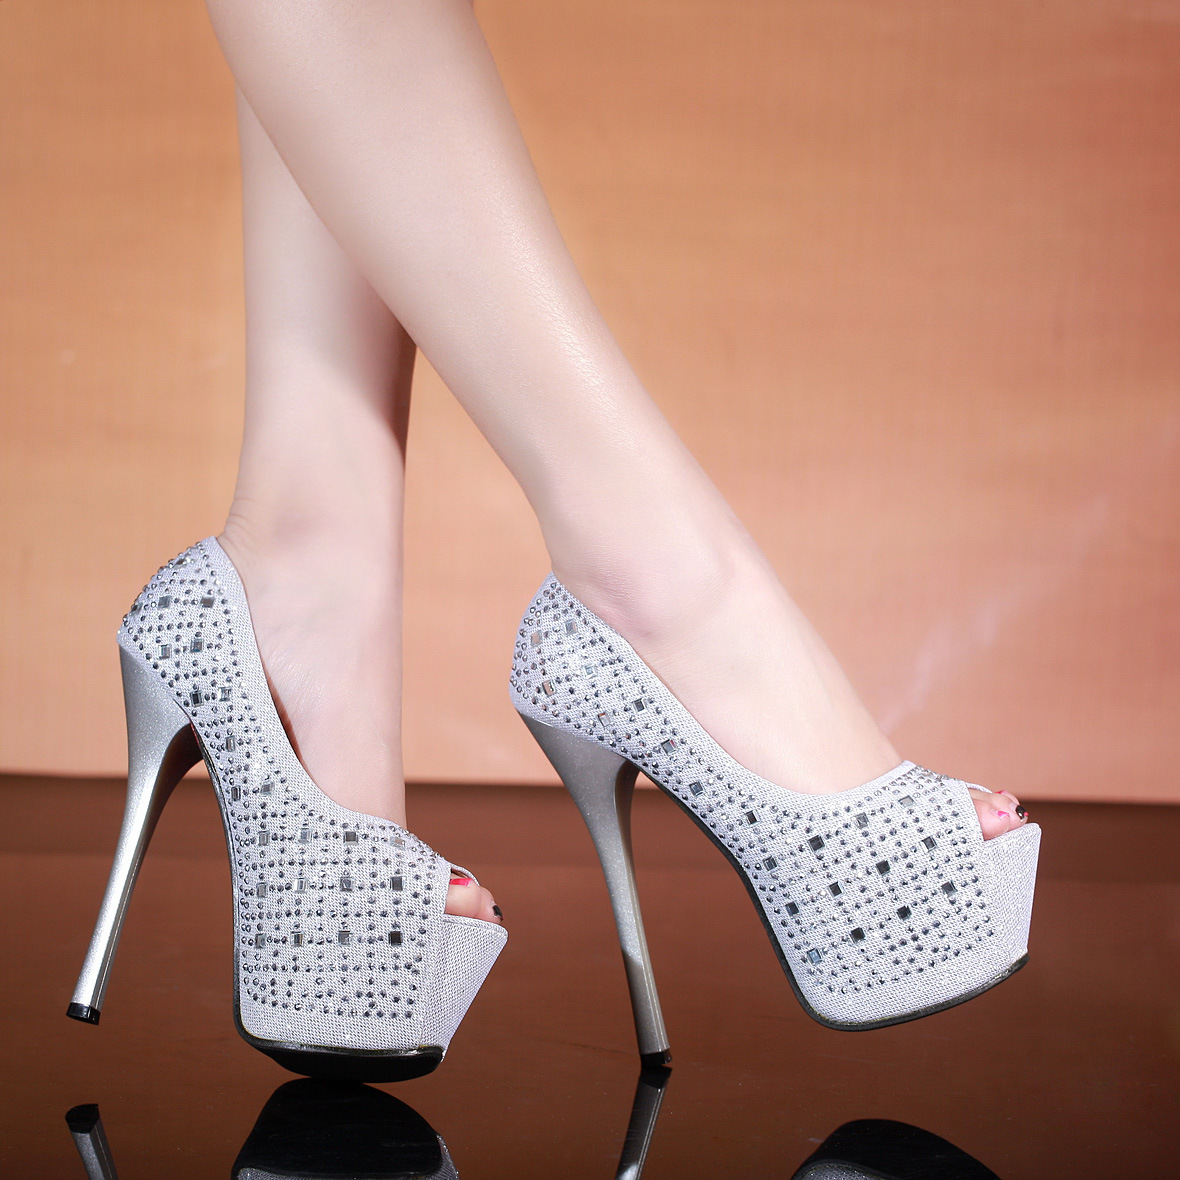 Extremely High Platform Heels